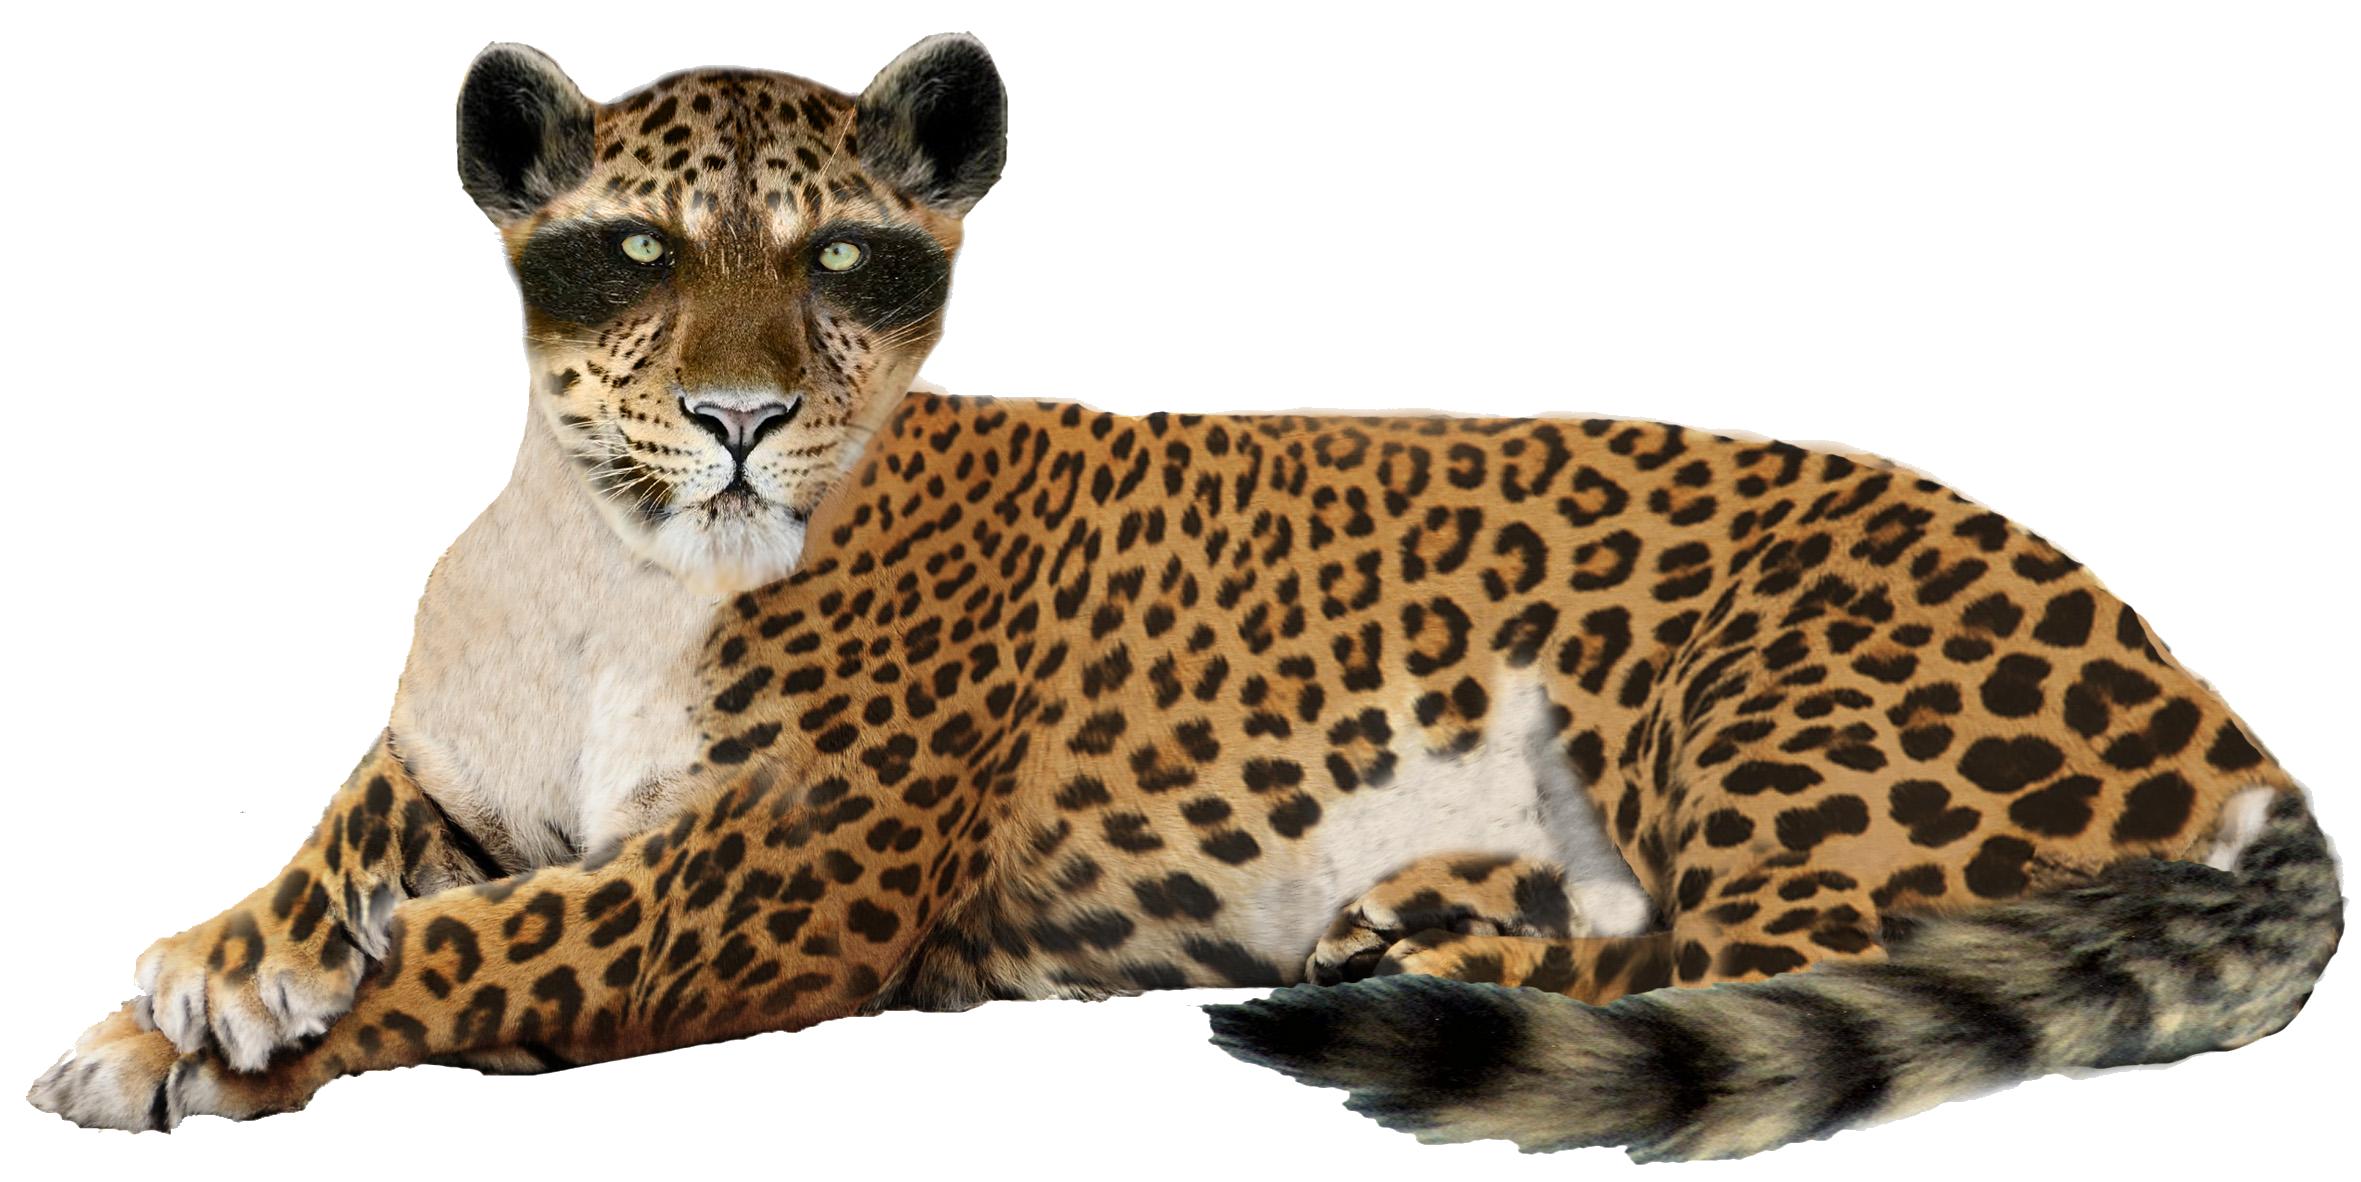 Leopard PNG Image - Free PNG Jaguar